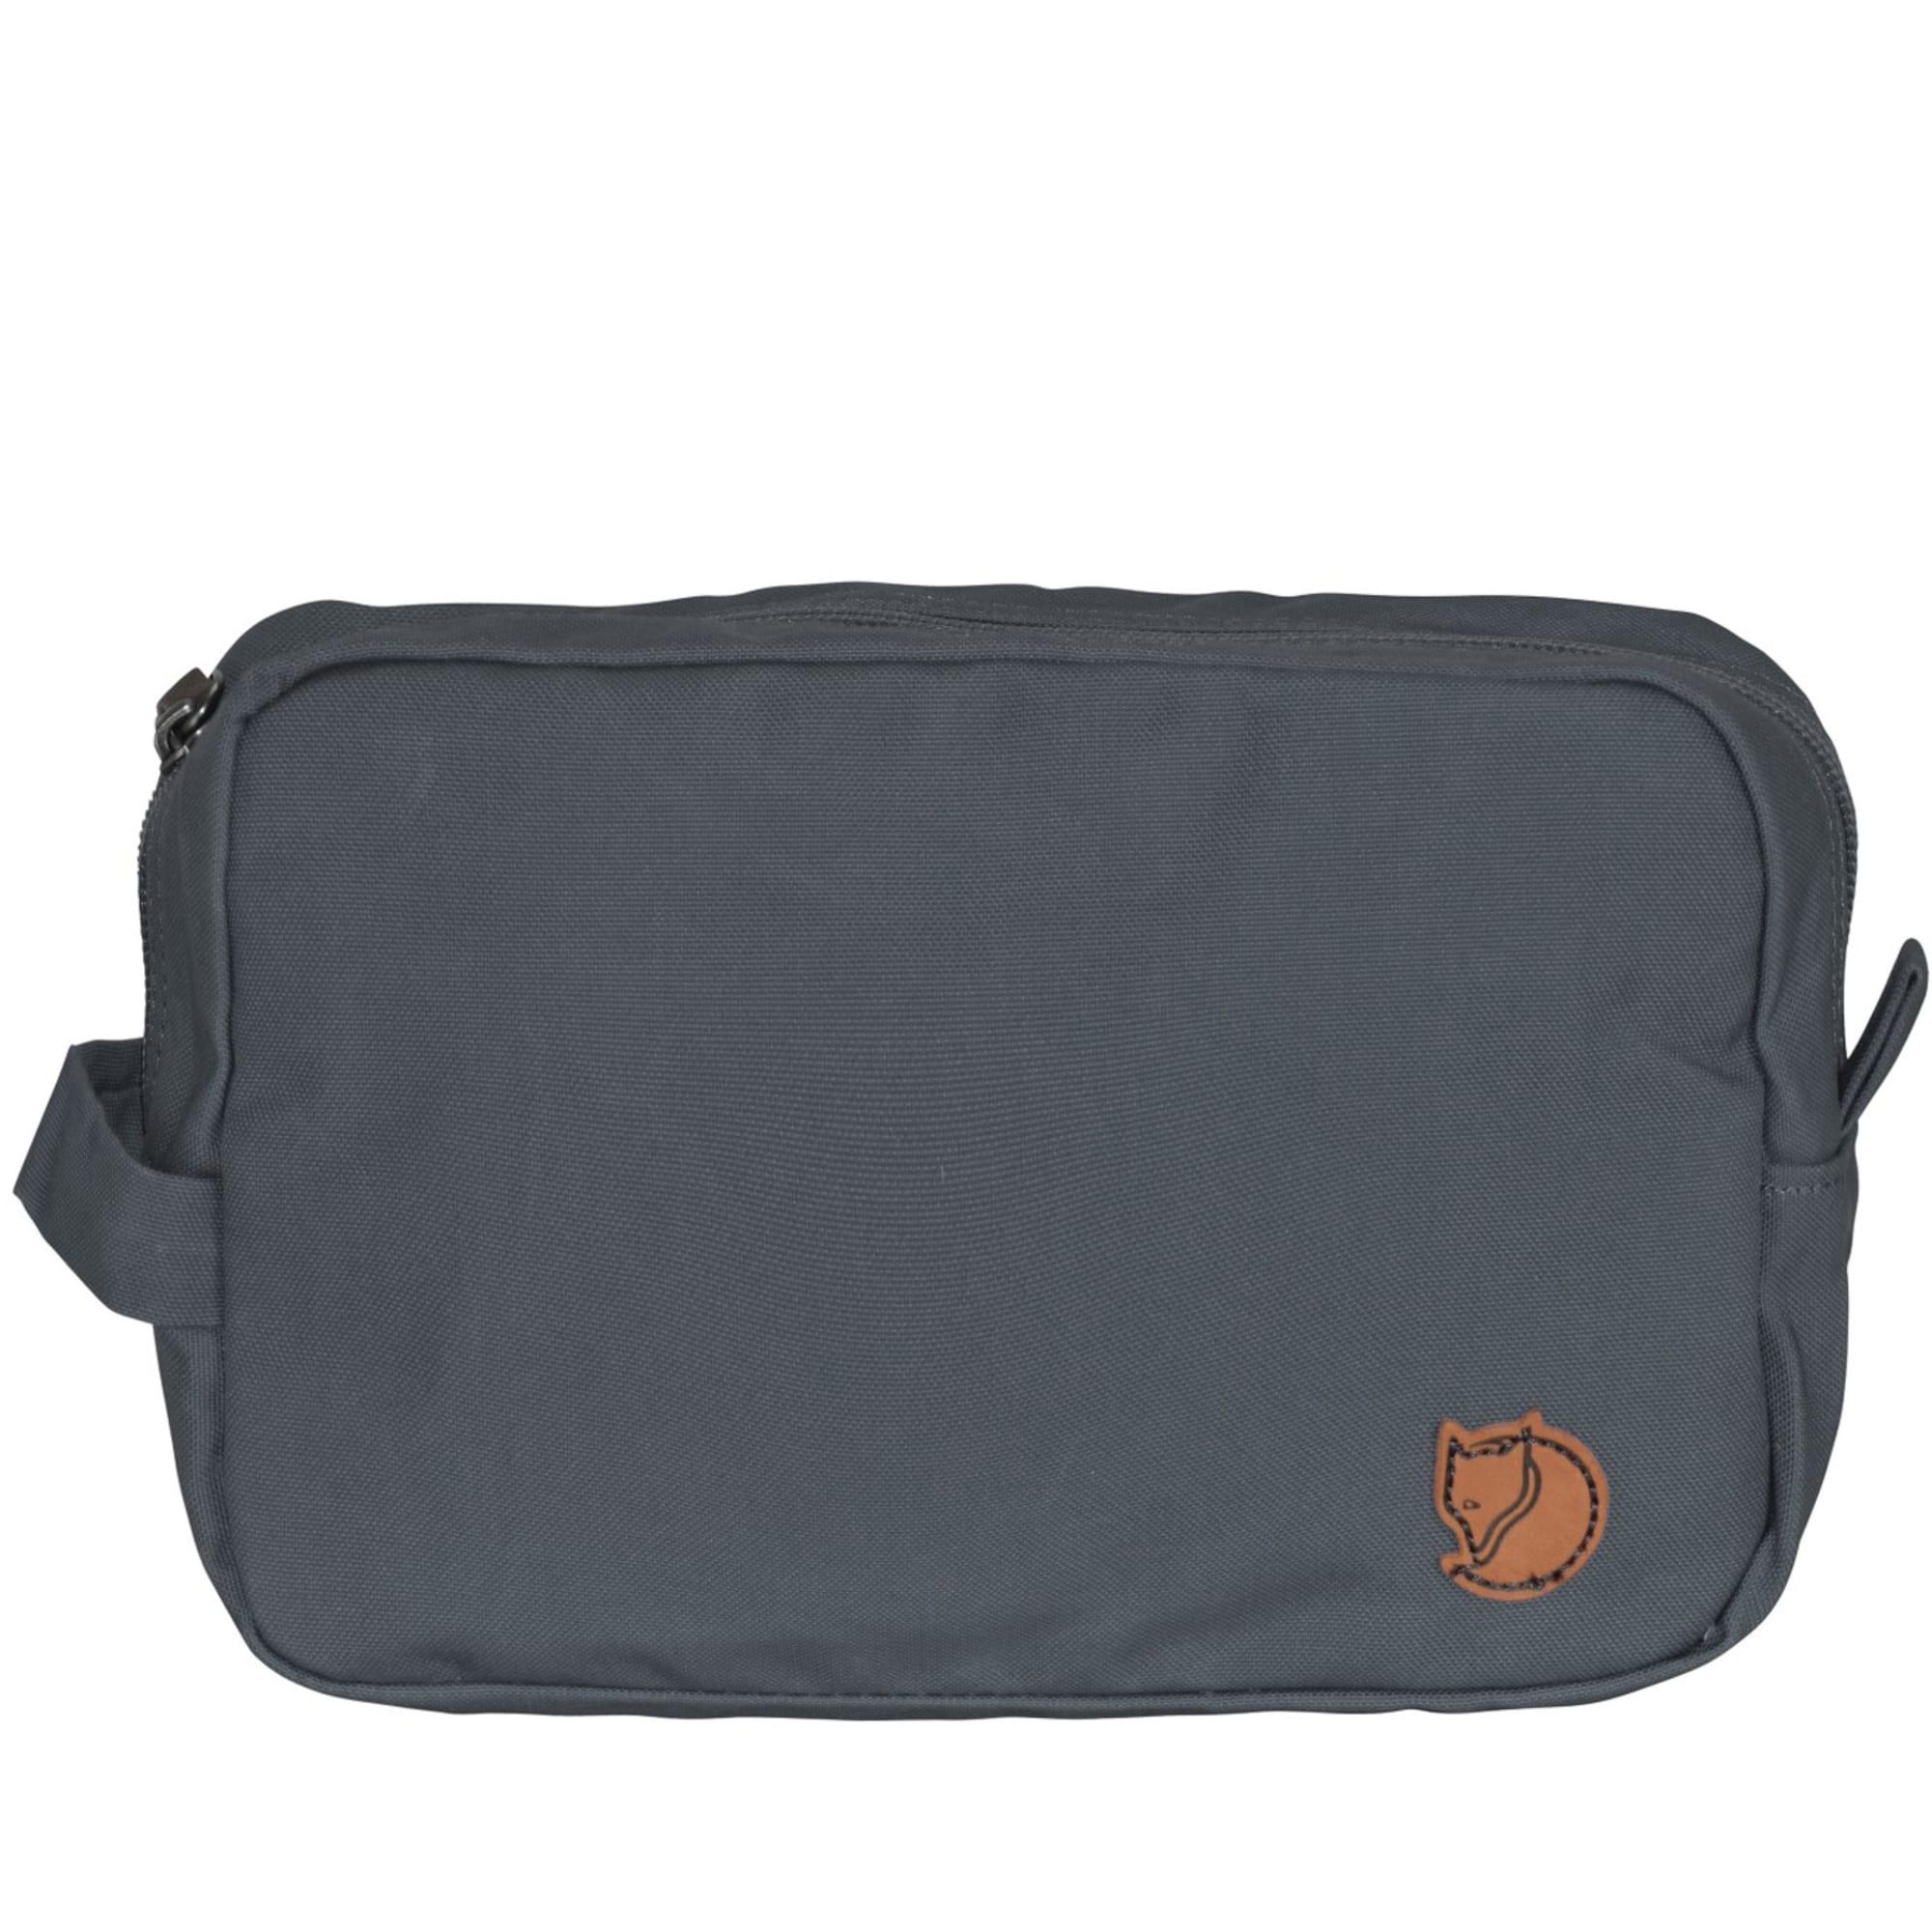 Gear Bag Large Toilettas